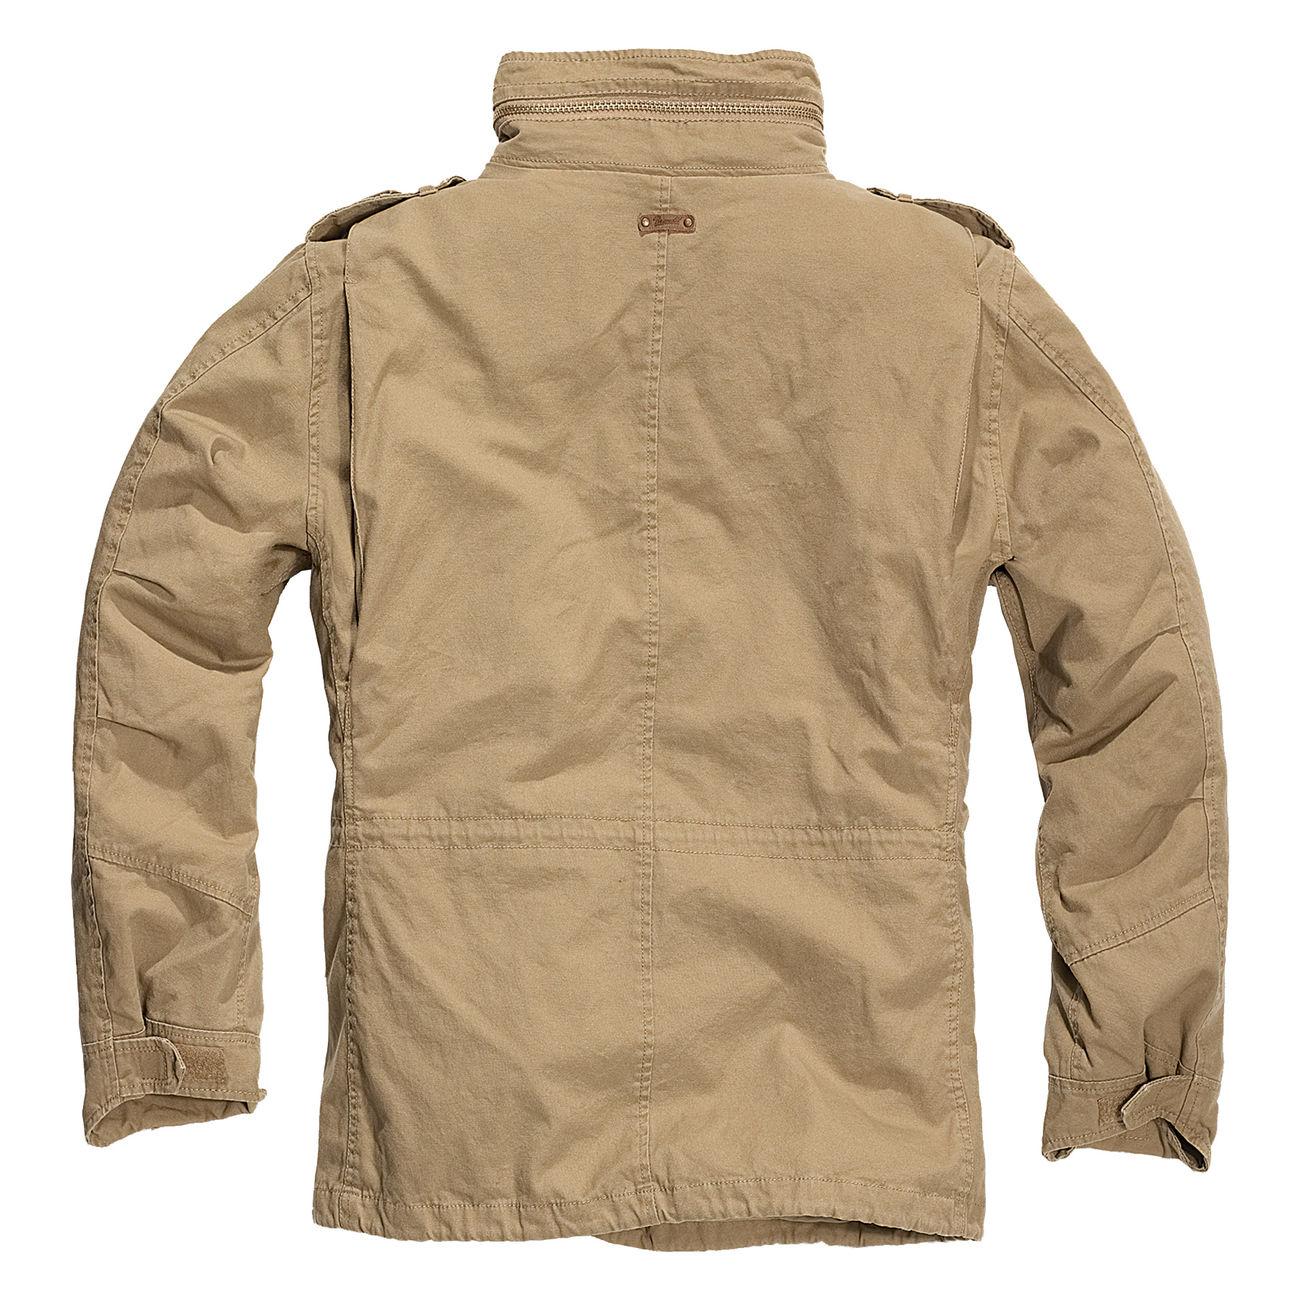 Brandit M65 Jacke Giant camel günstig kaufen - Kotte   Zeller 9a83d1092c